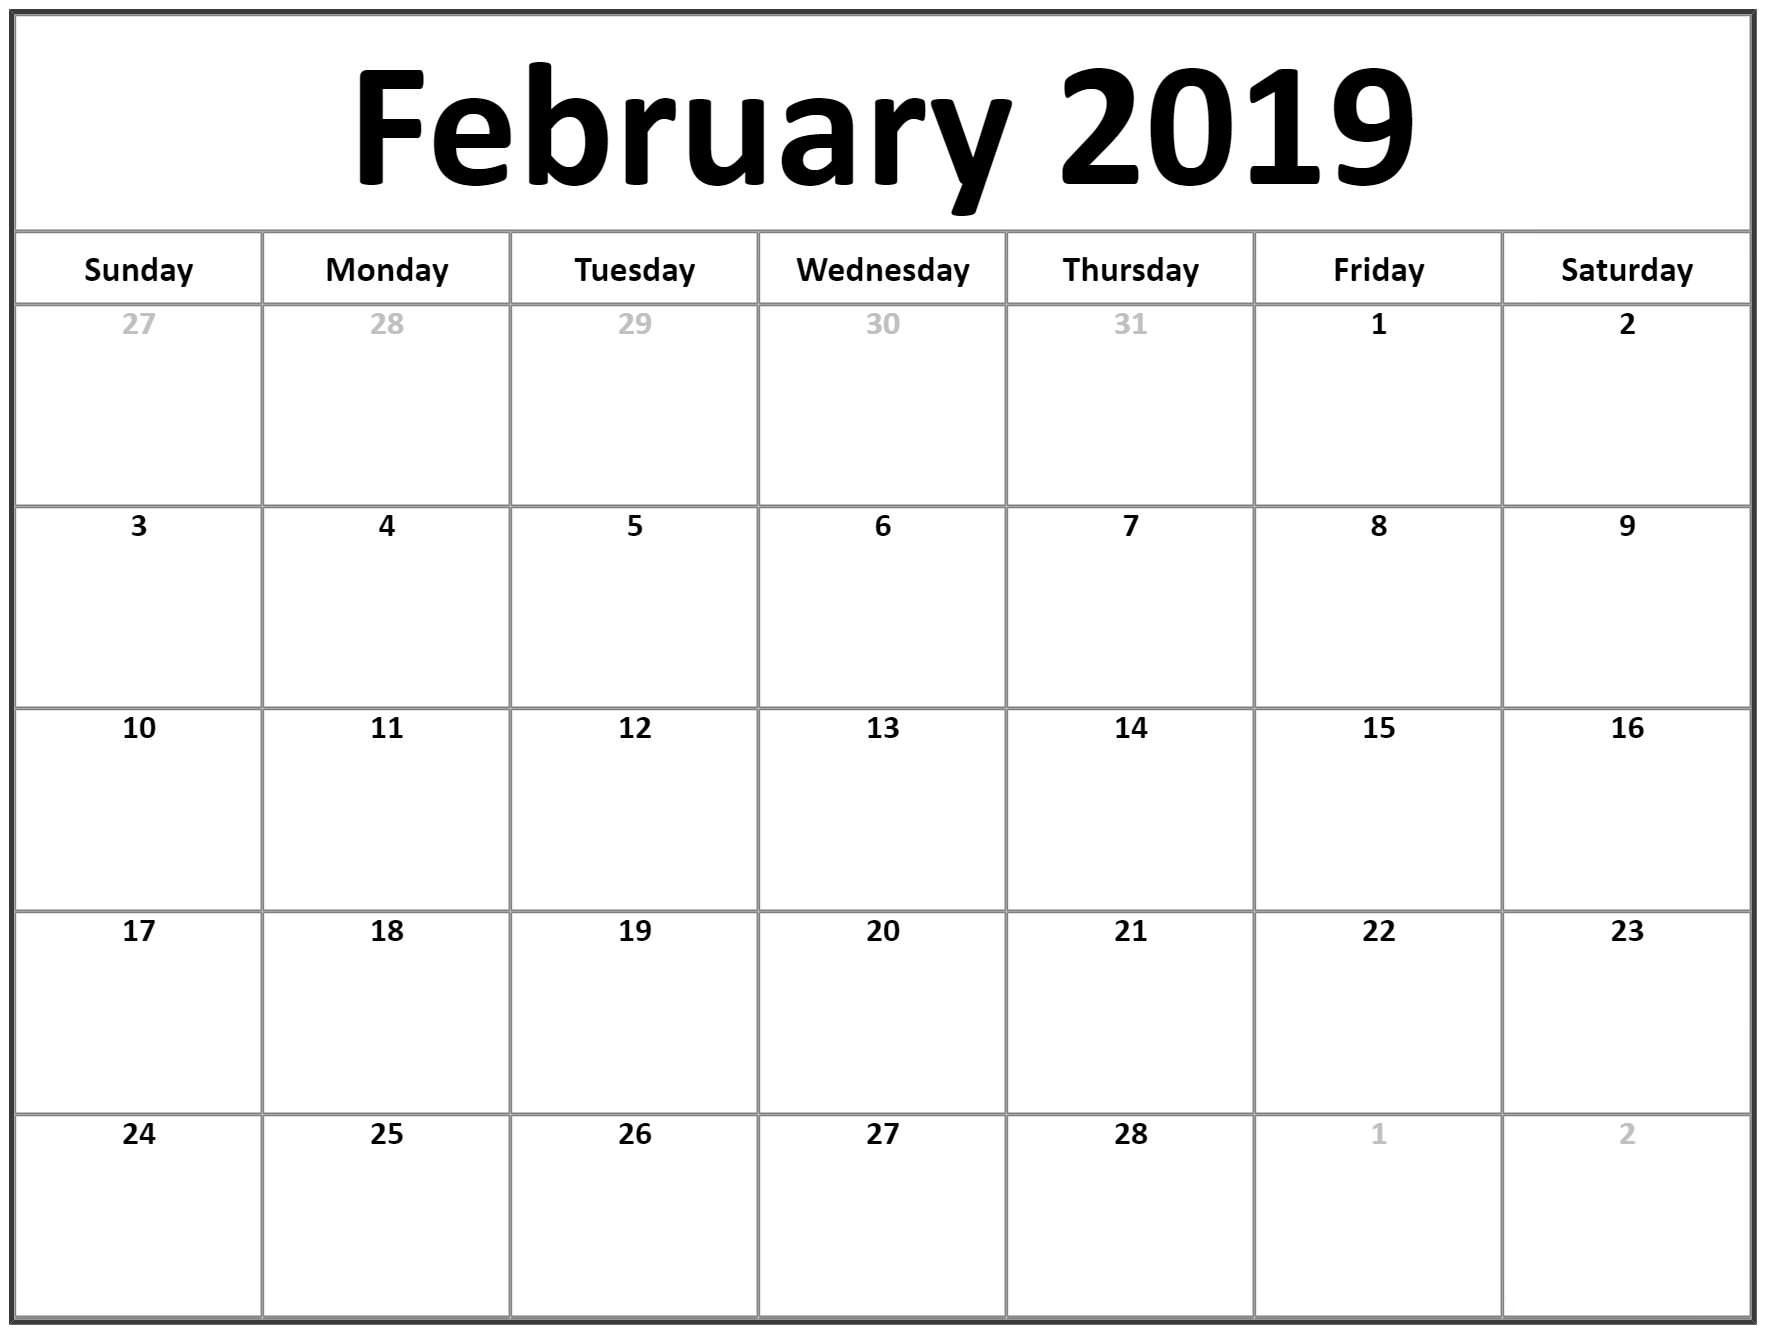 February Calendar 2019 to Print